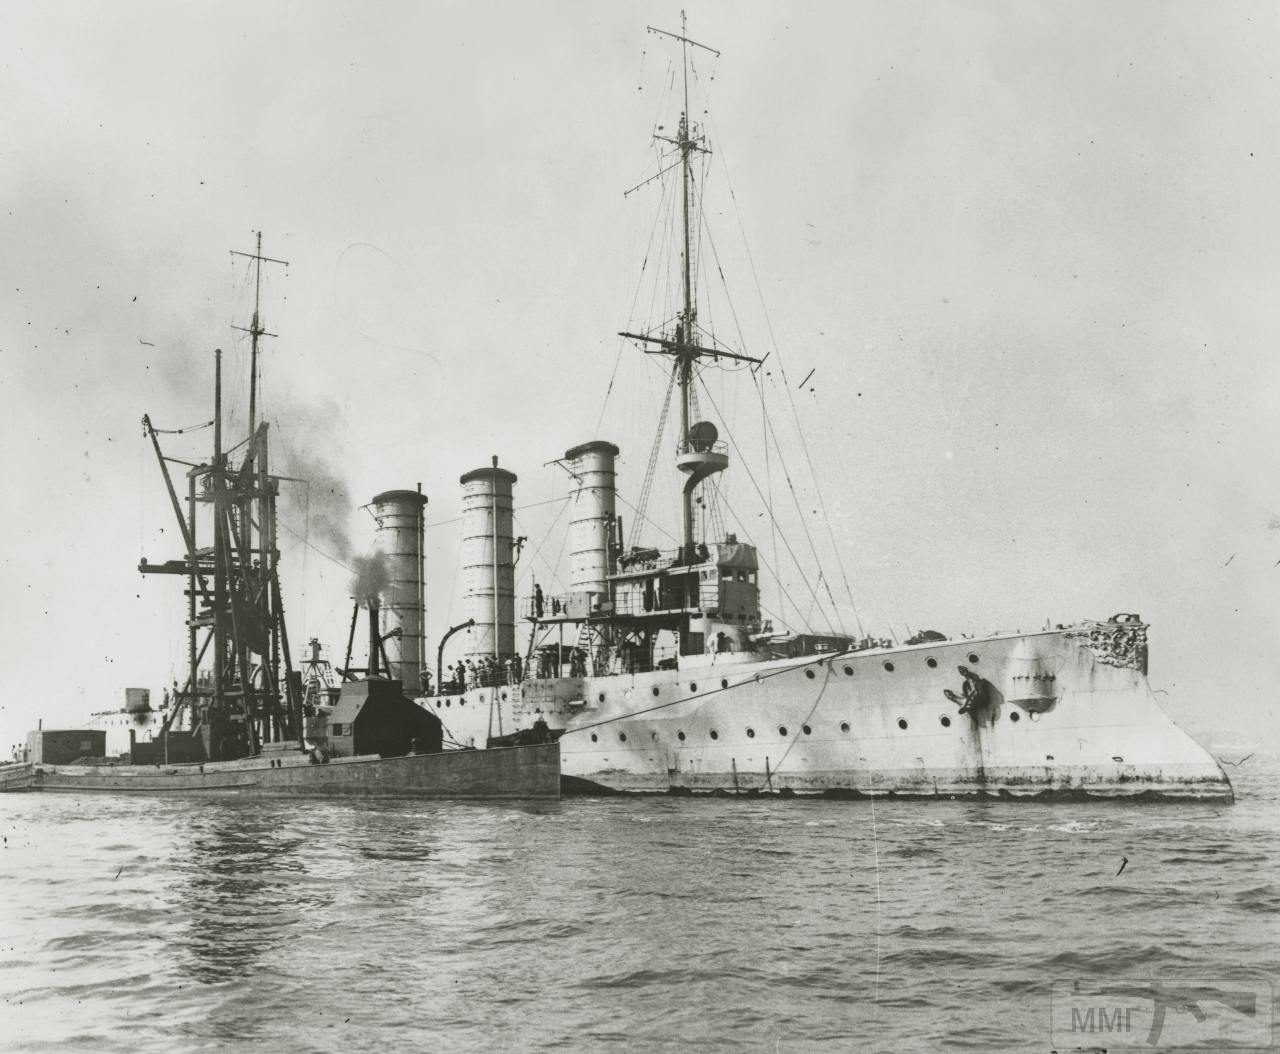 82084 - SMS Leipzig грузится углем в Сан-Франциско, 18 августа 1914 г.